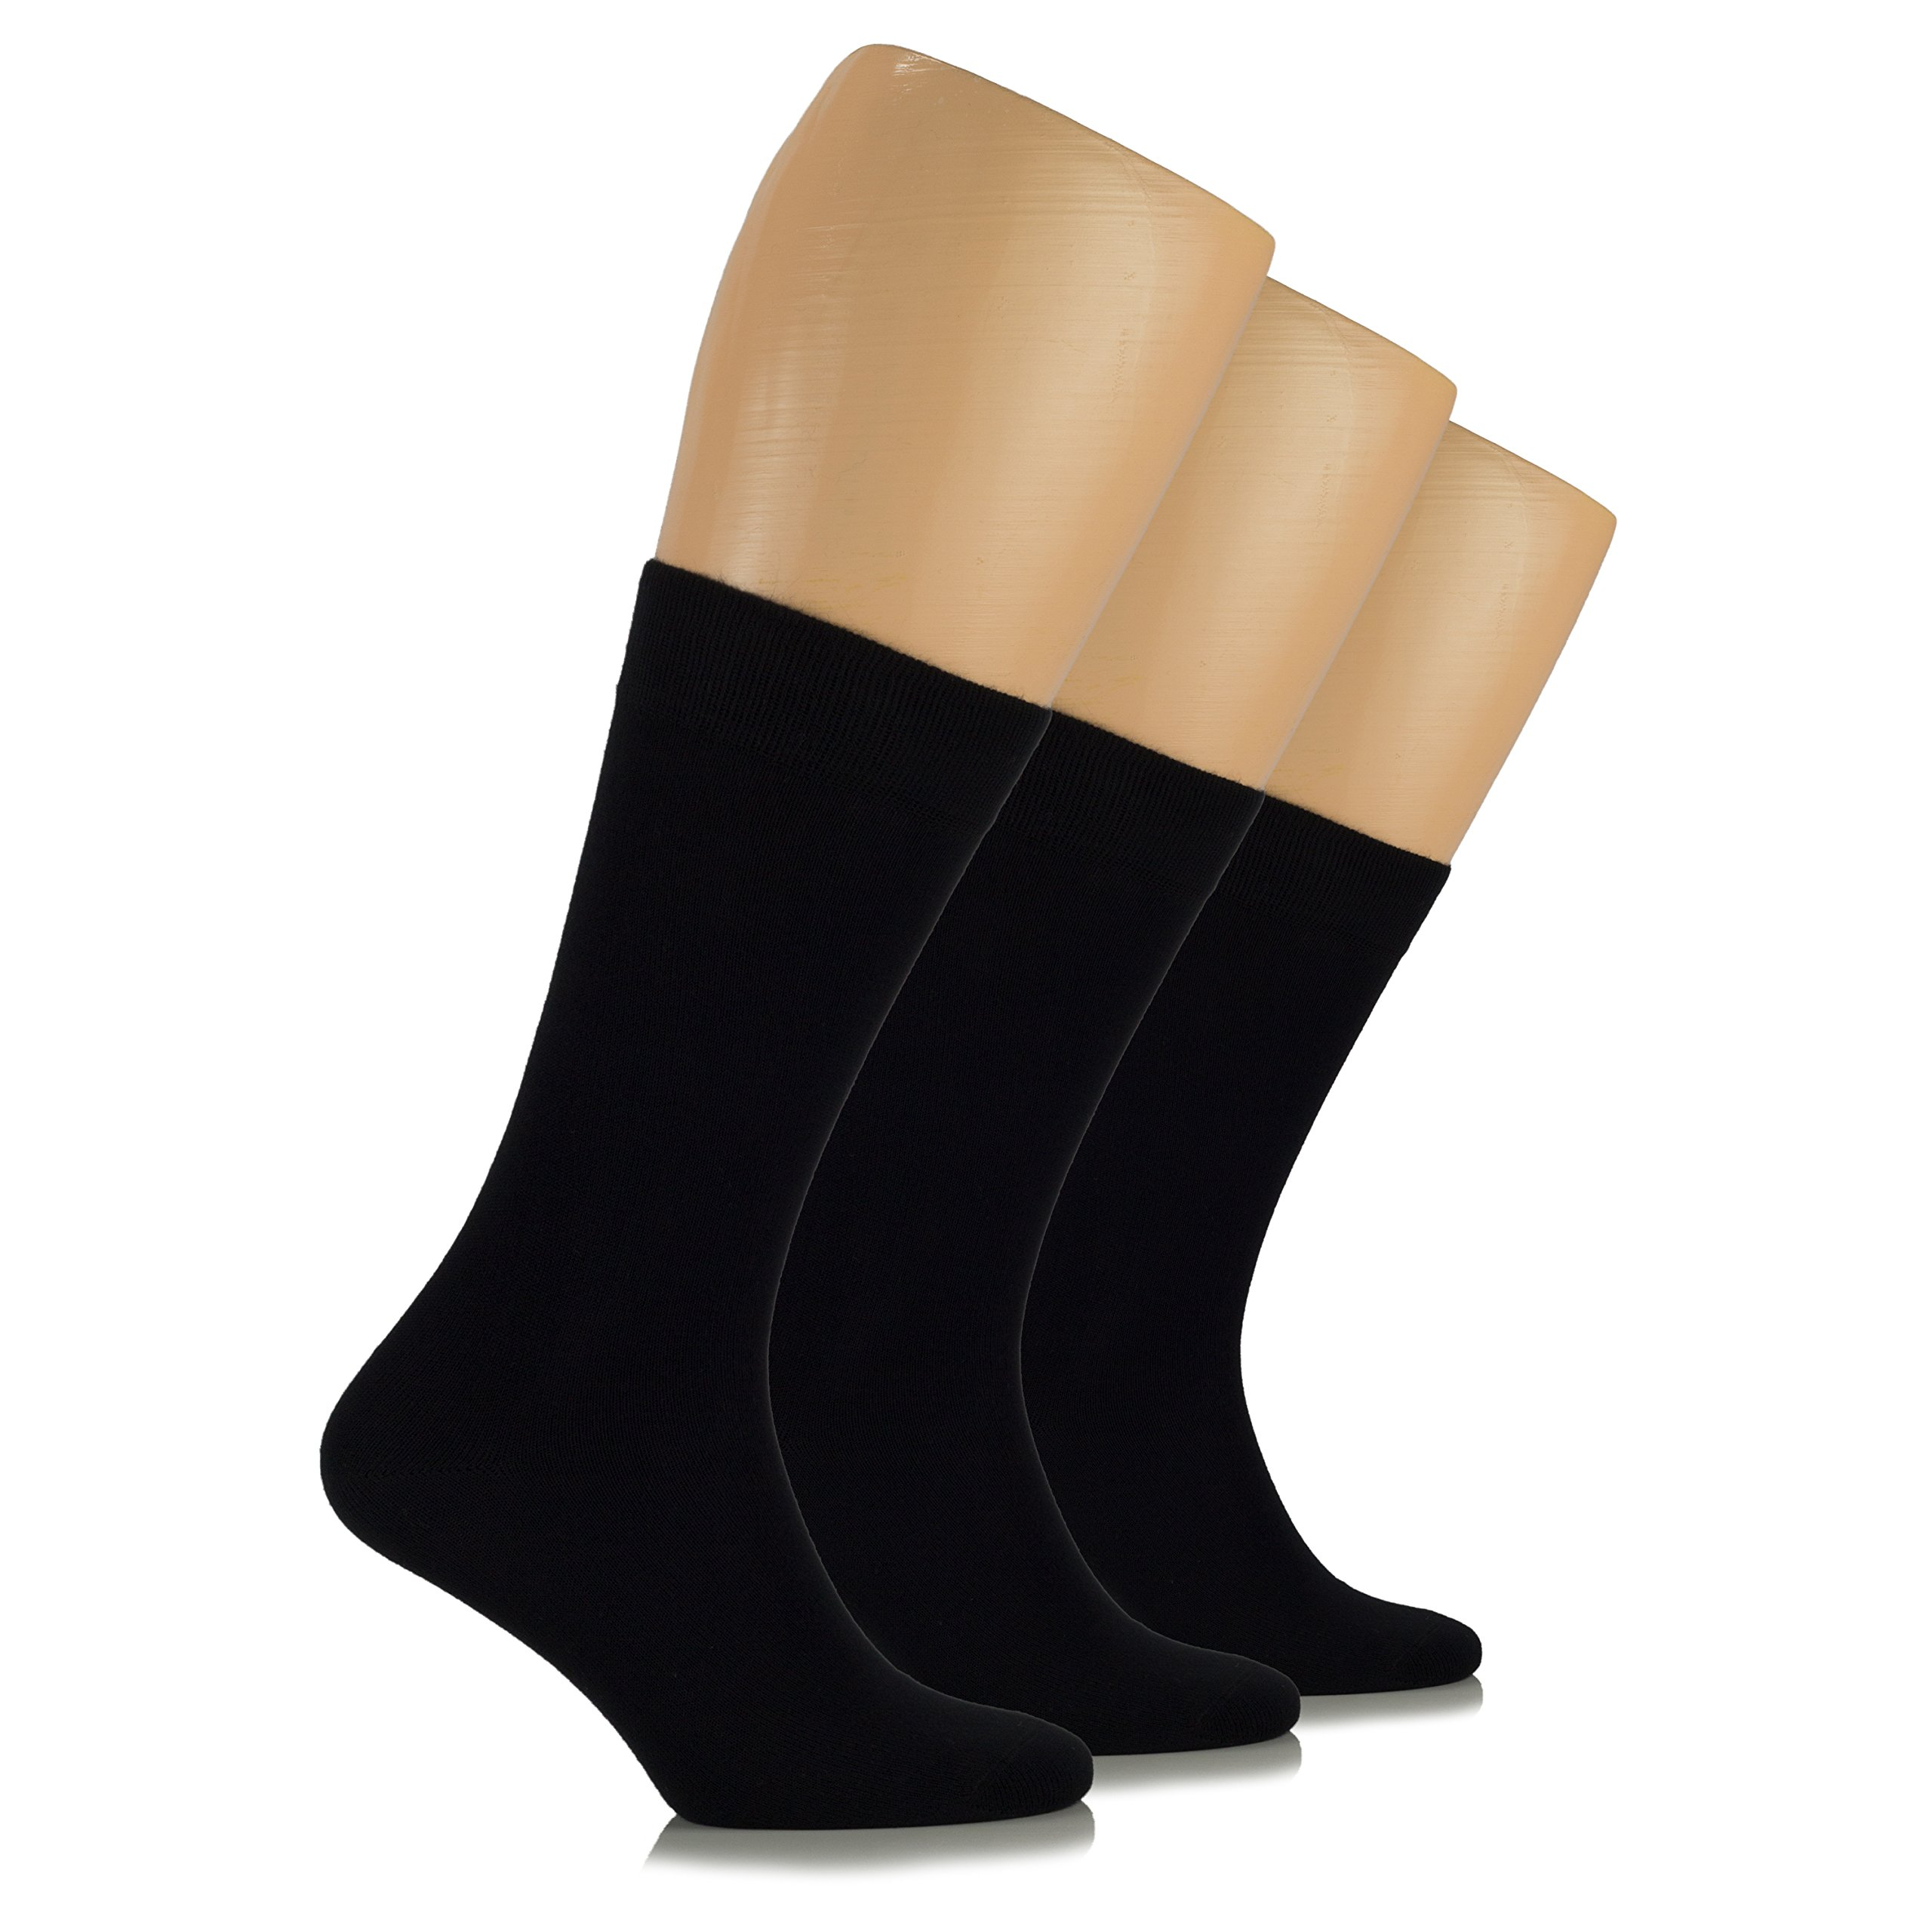 Hugh Ugoli Women's Dress Crew Socks Bamboo Business Casual Comfort Seam (Shoe size: 6-9, Black)